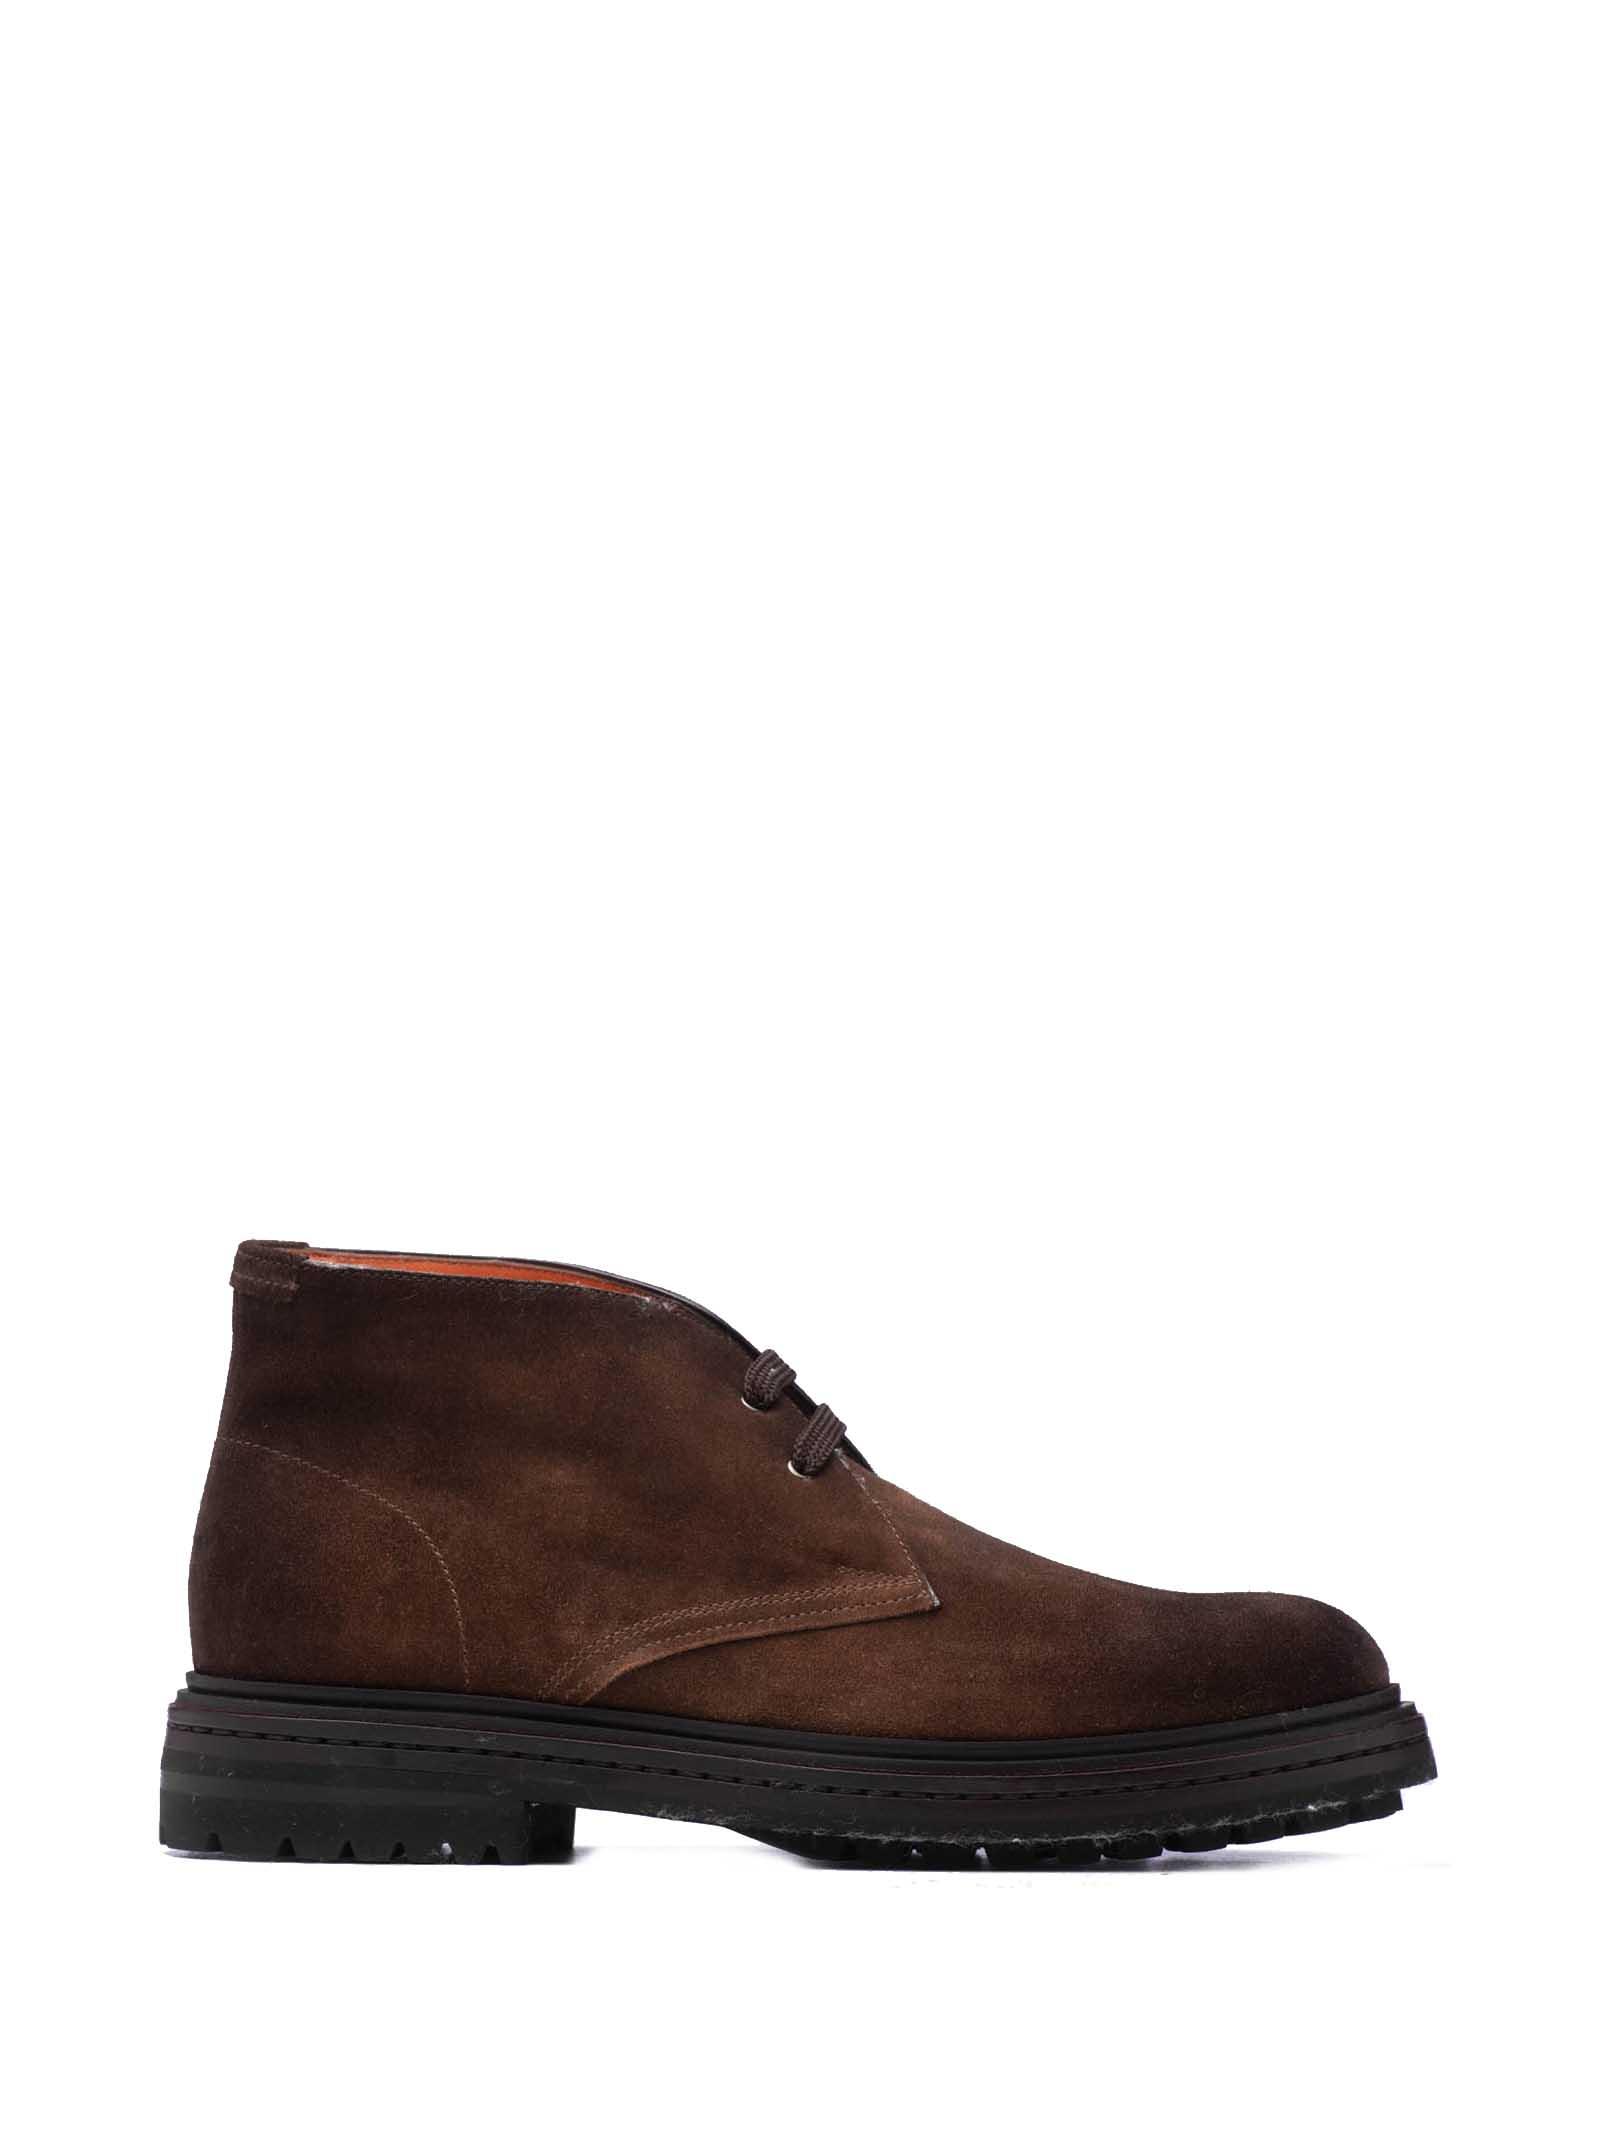 Santoni Santoni 1^ Linea Suede Ankle Boots